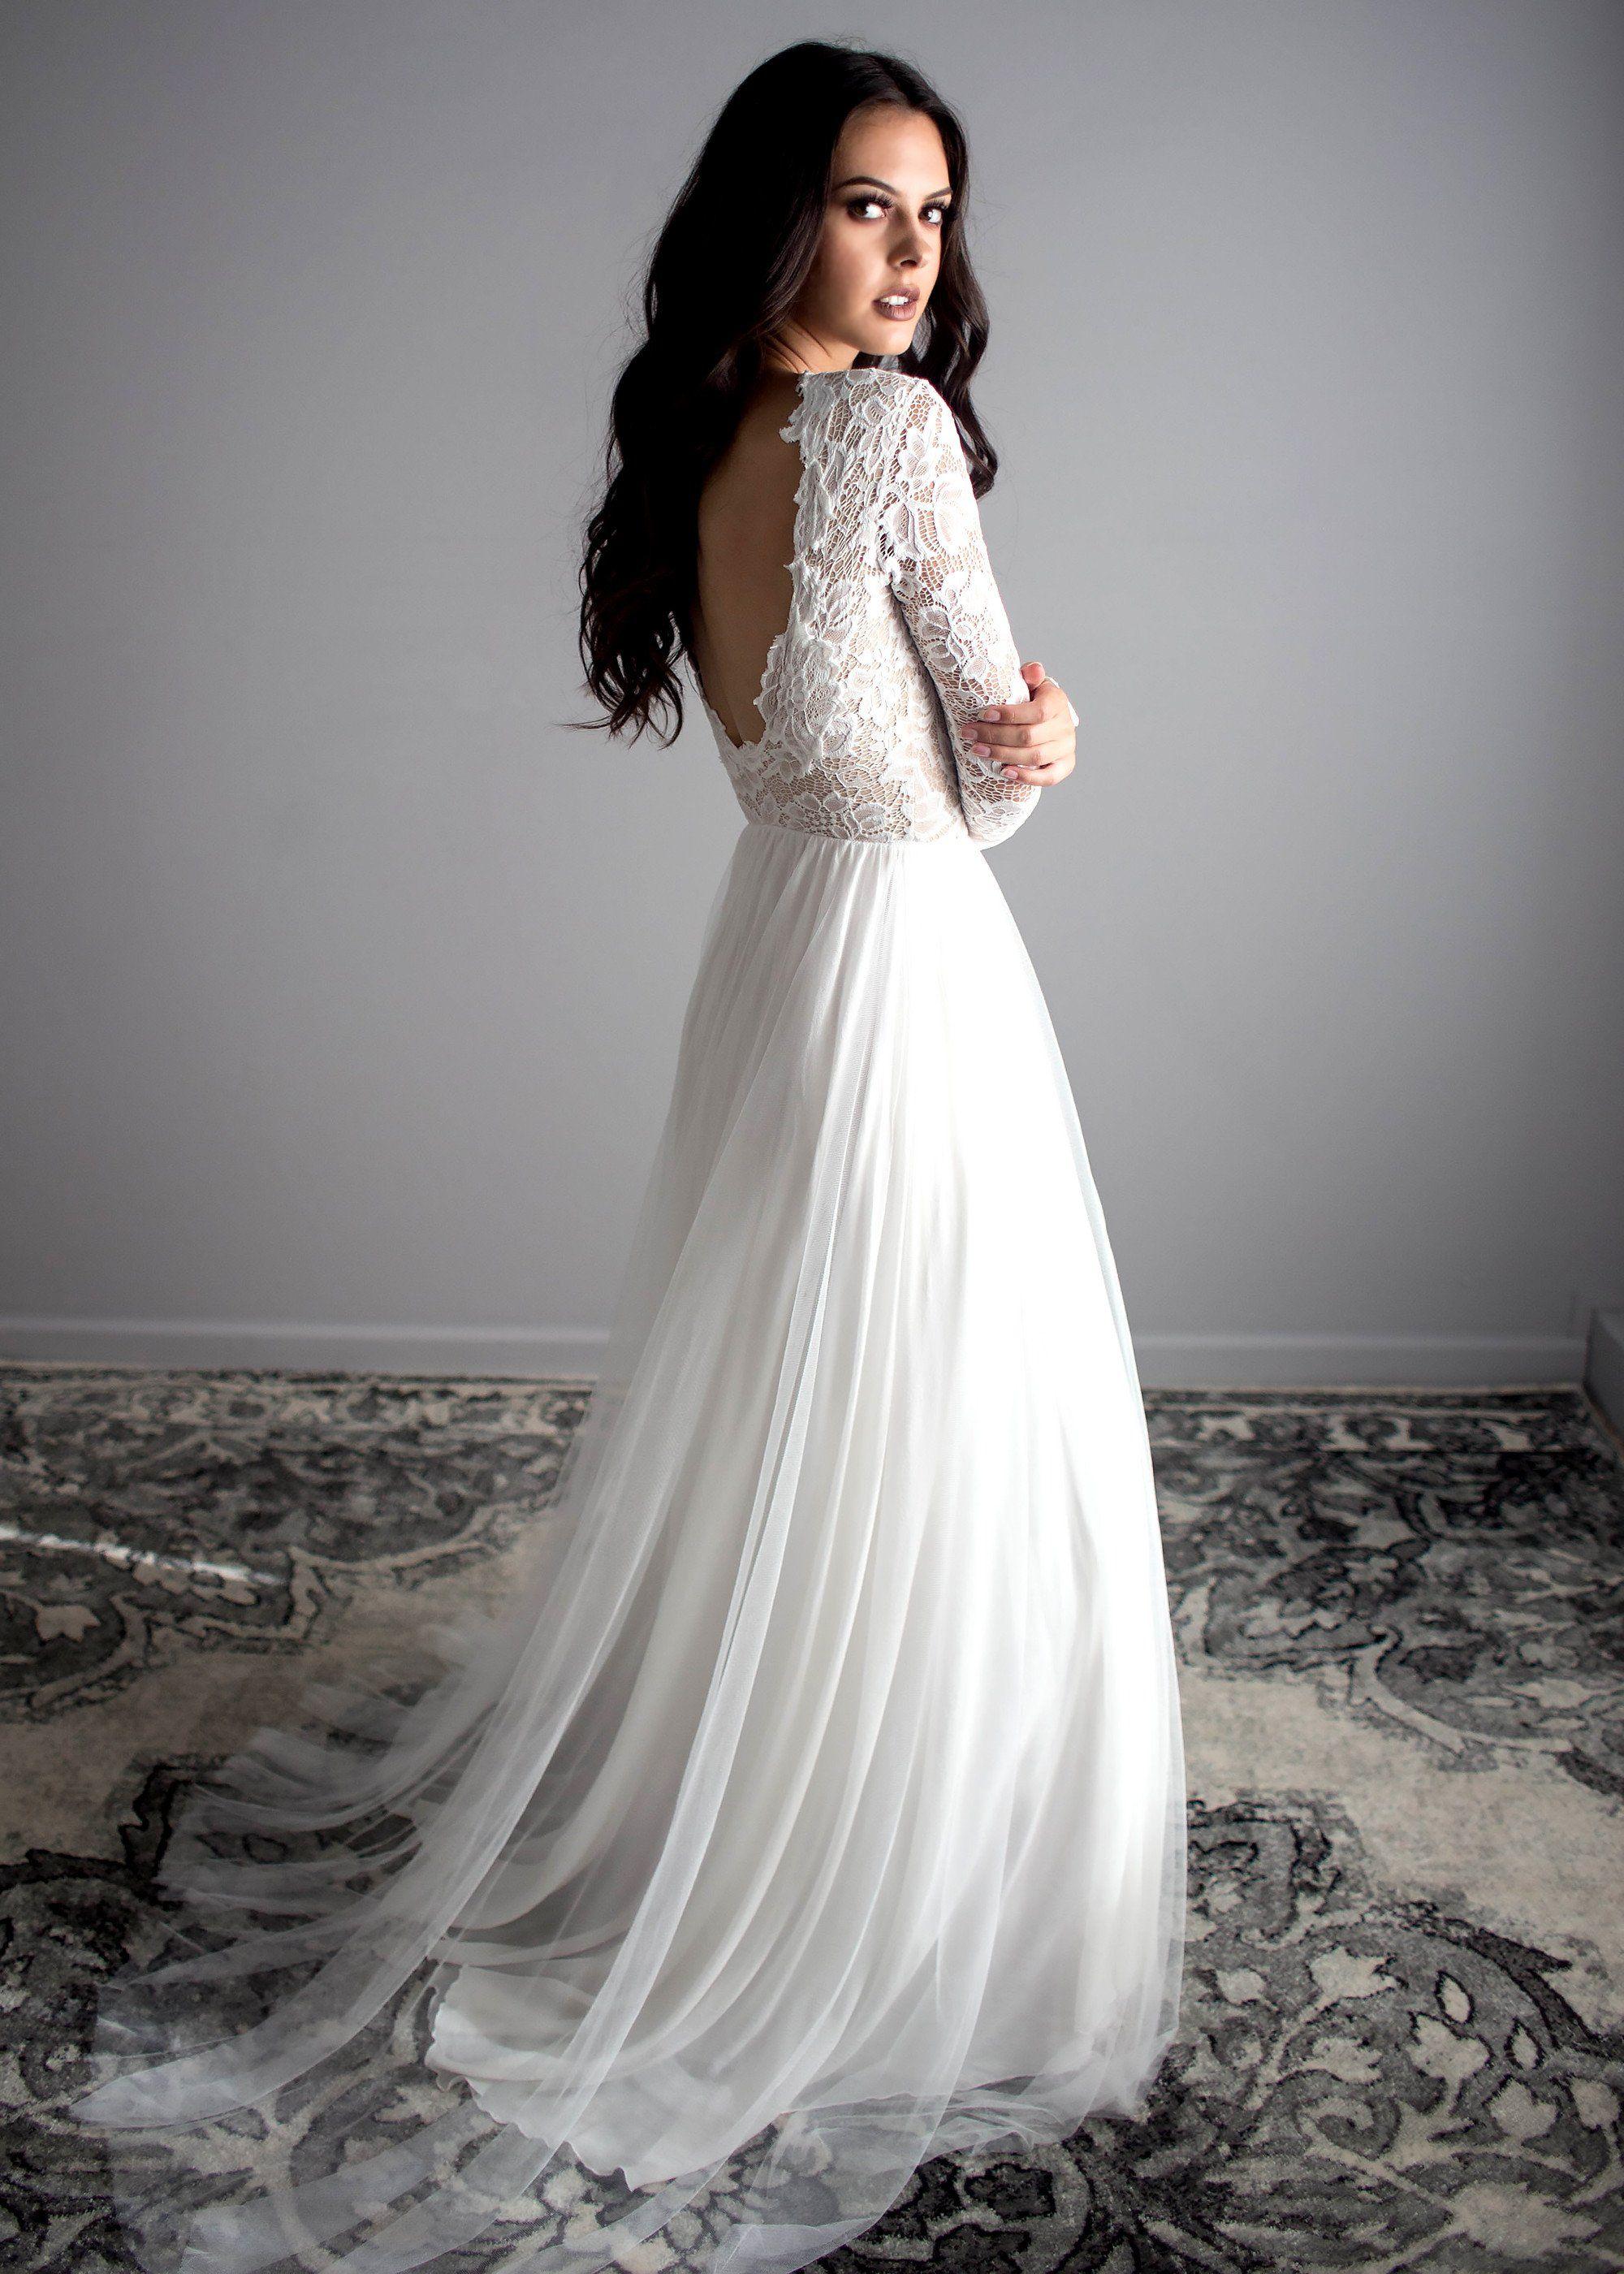 Zoey scoopback dress indie wedding dress hippy wedding dresses